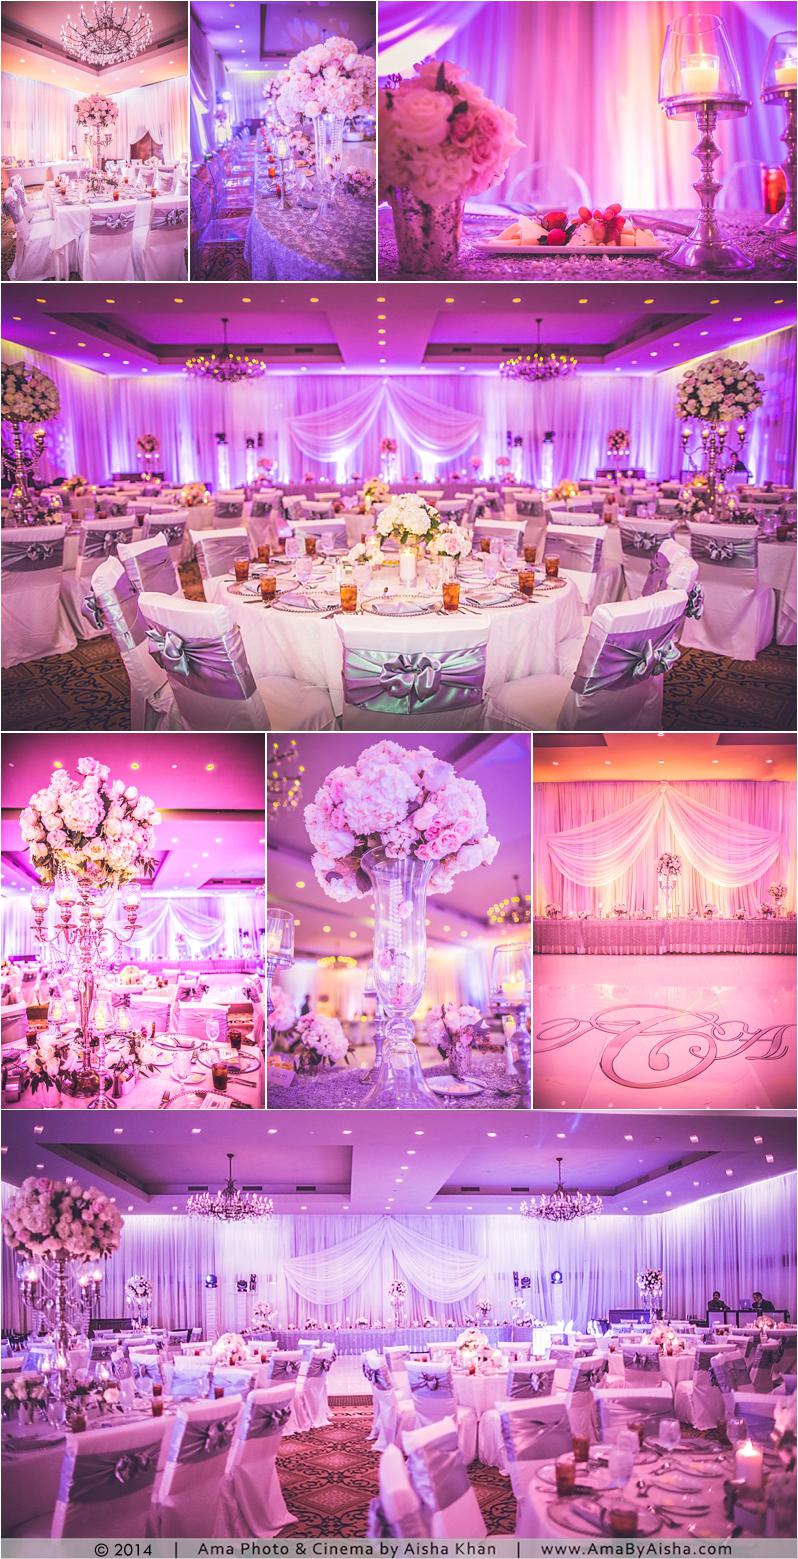 ©2014 | www.AmaByAisha.com | Texas wedding photographer | Reception details